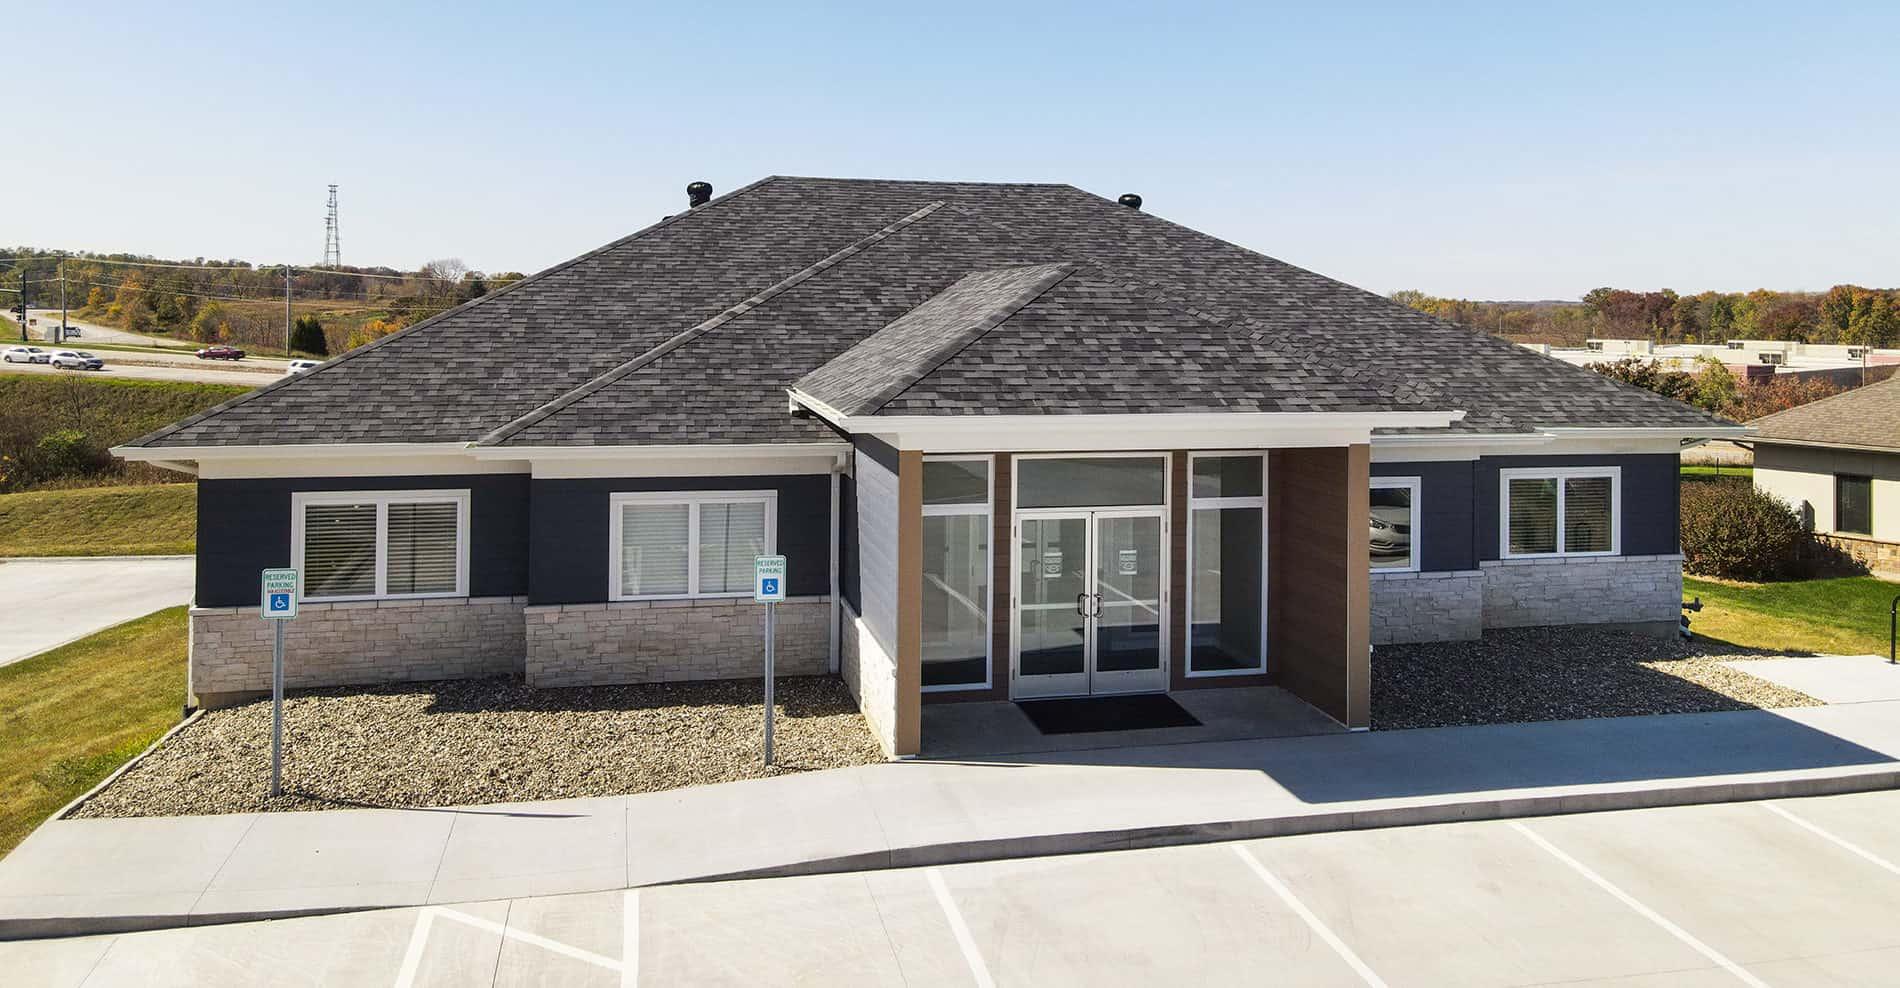 RMN provides USDA Rural Development home loans